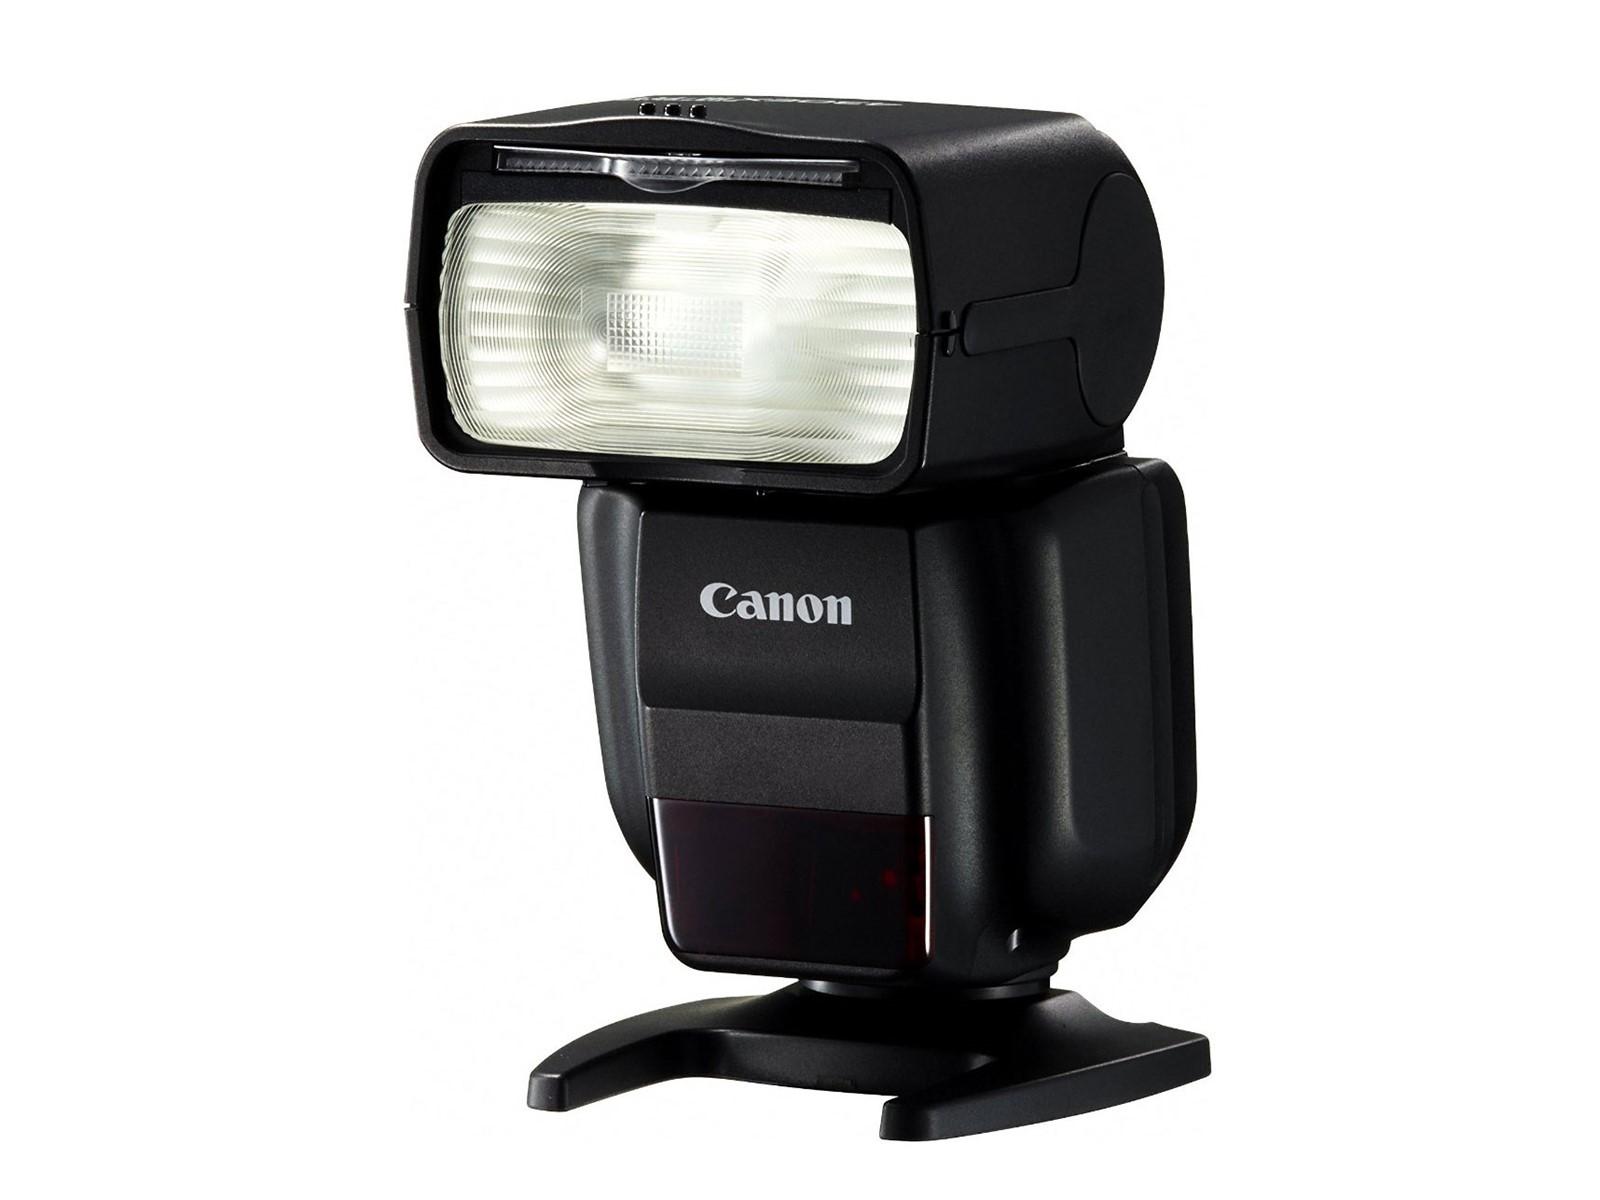 Canon Speedlite 430EX III-RT announced with built-in radio master - Lighting Rumours